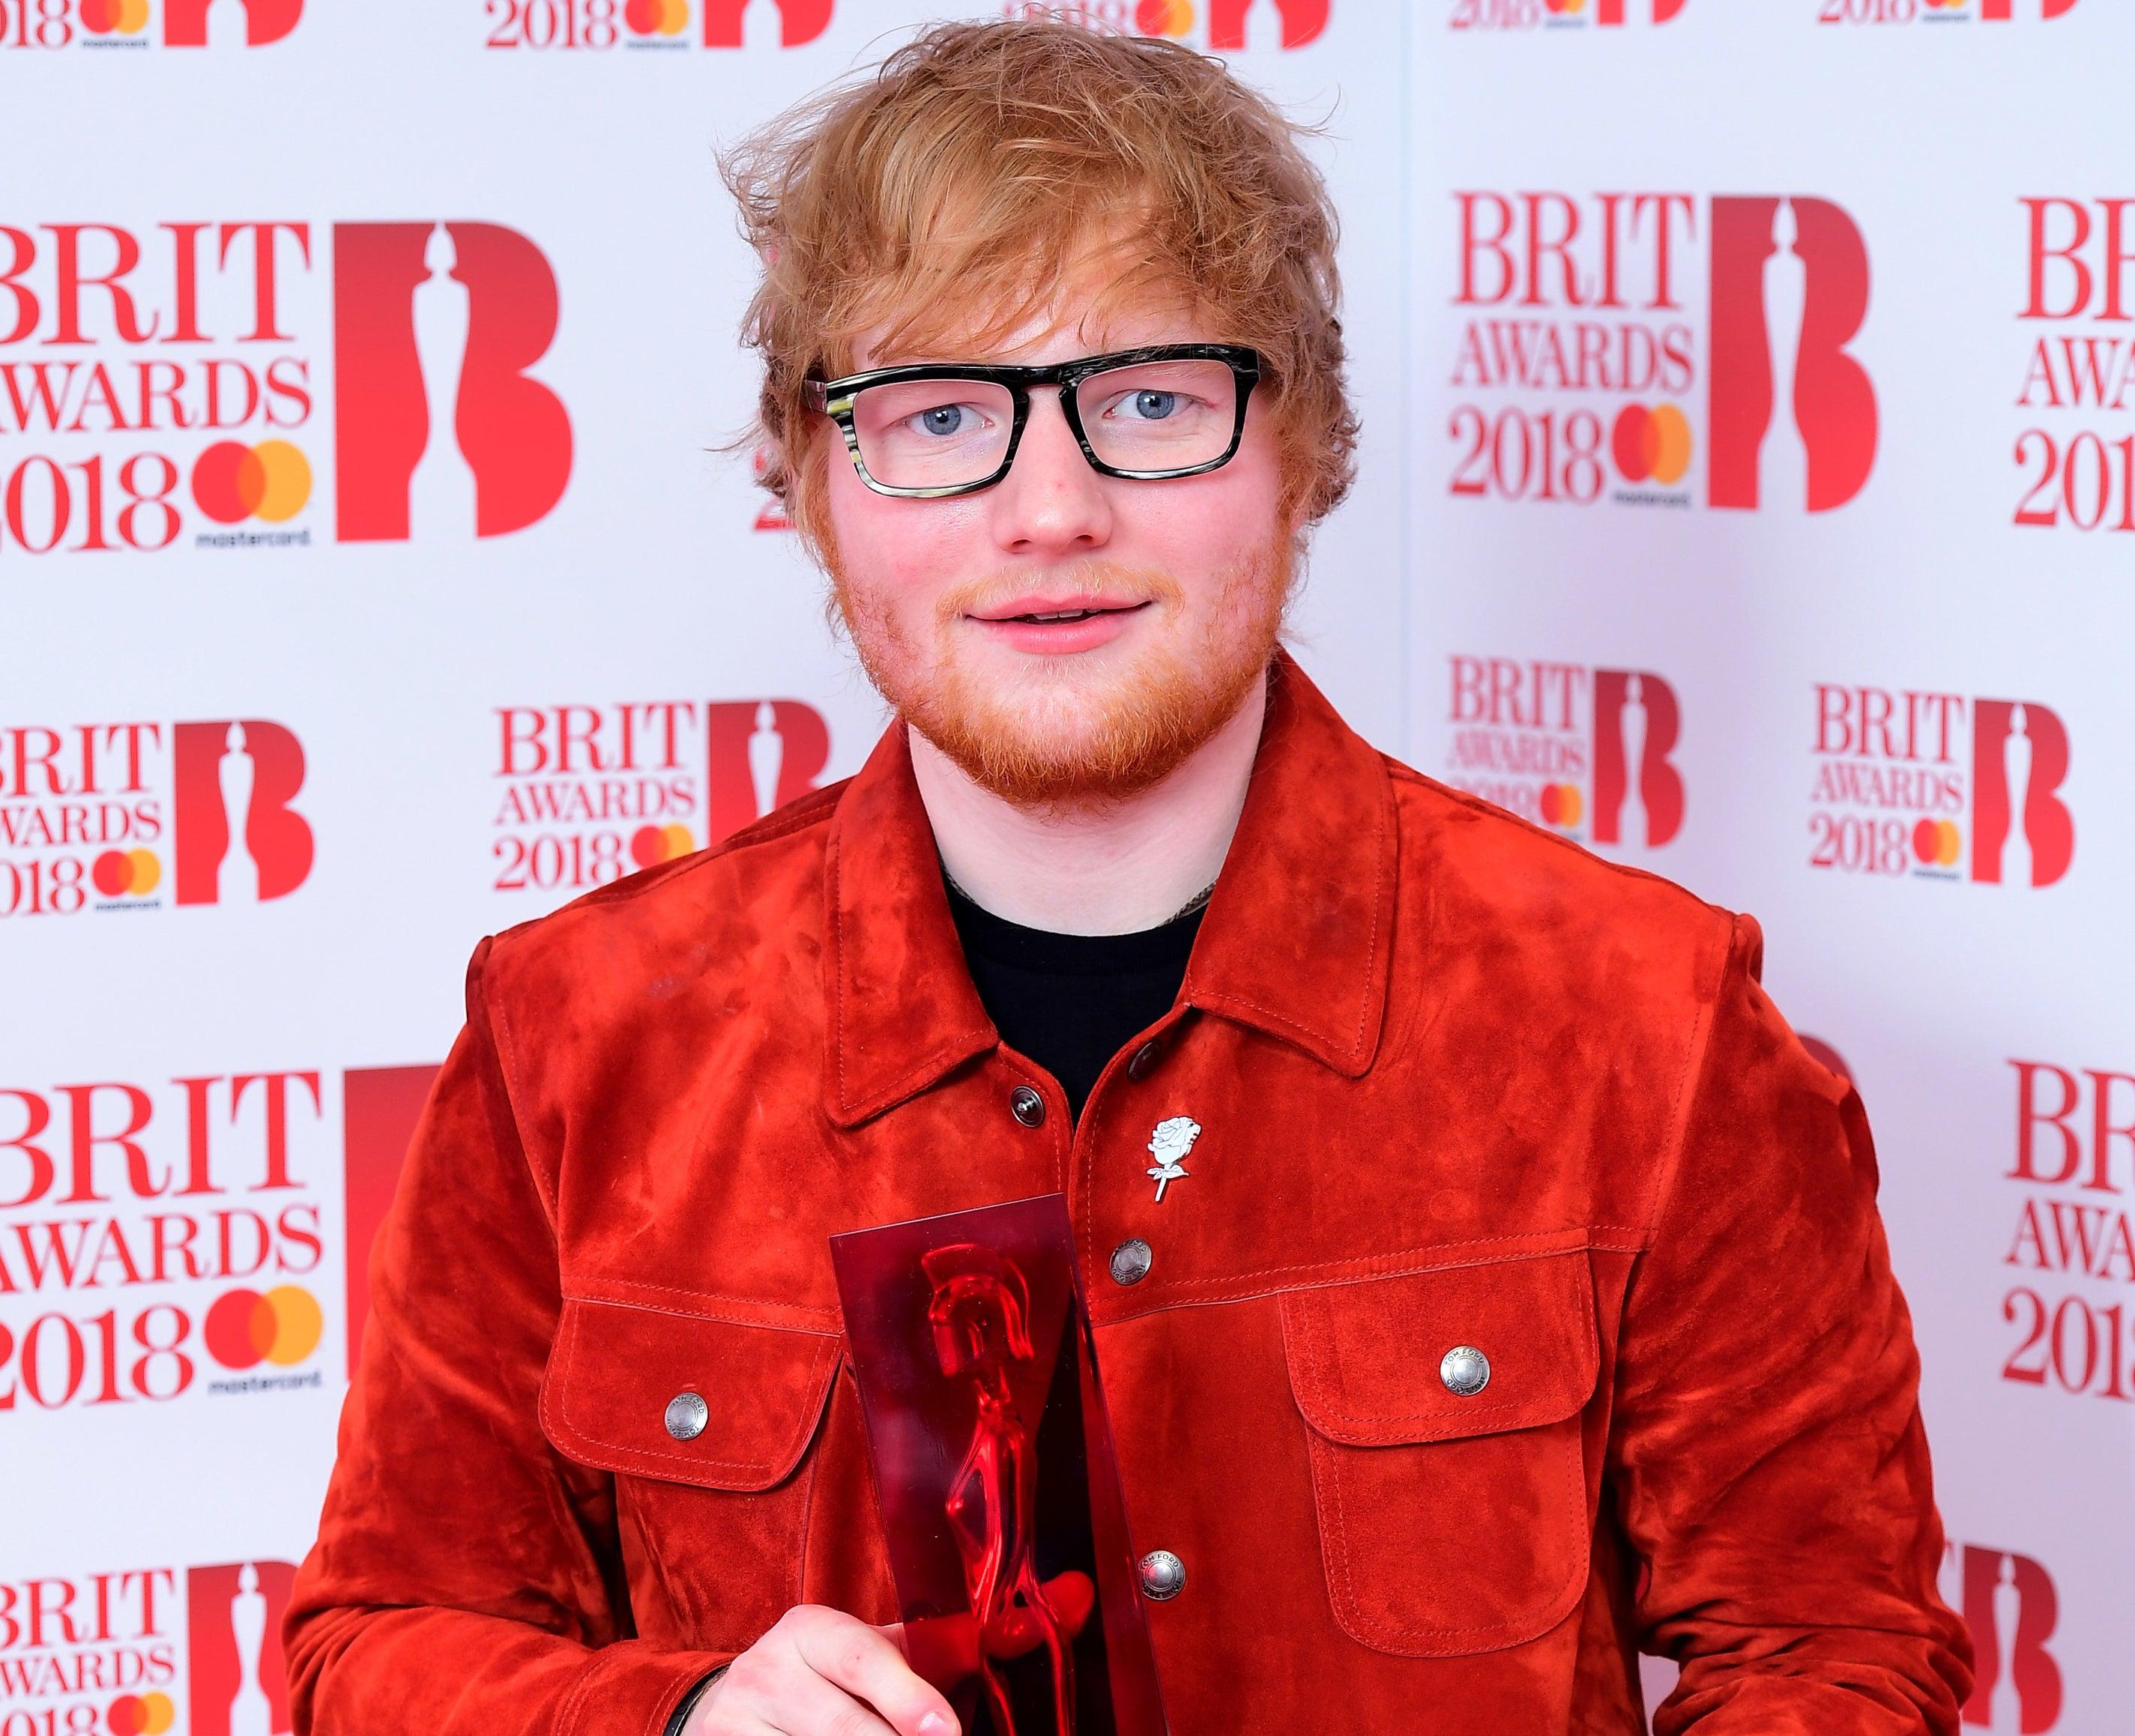 Ed holds up an award at the Brits